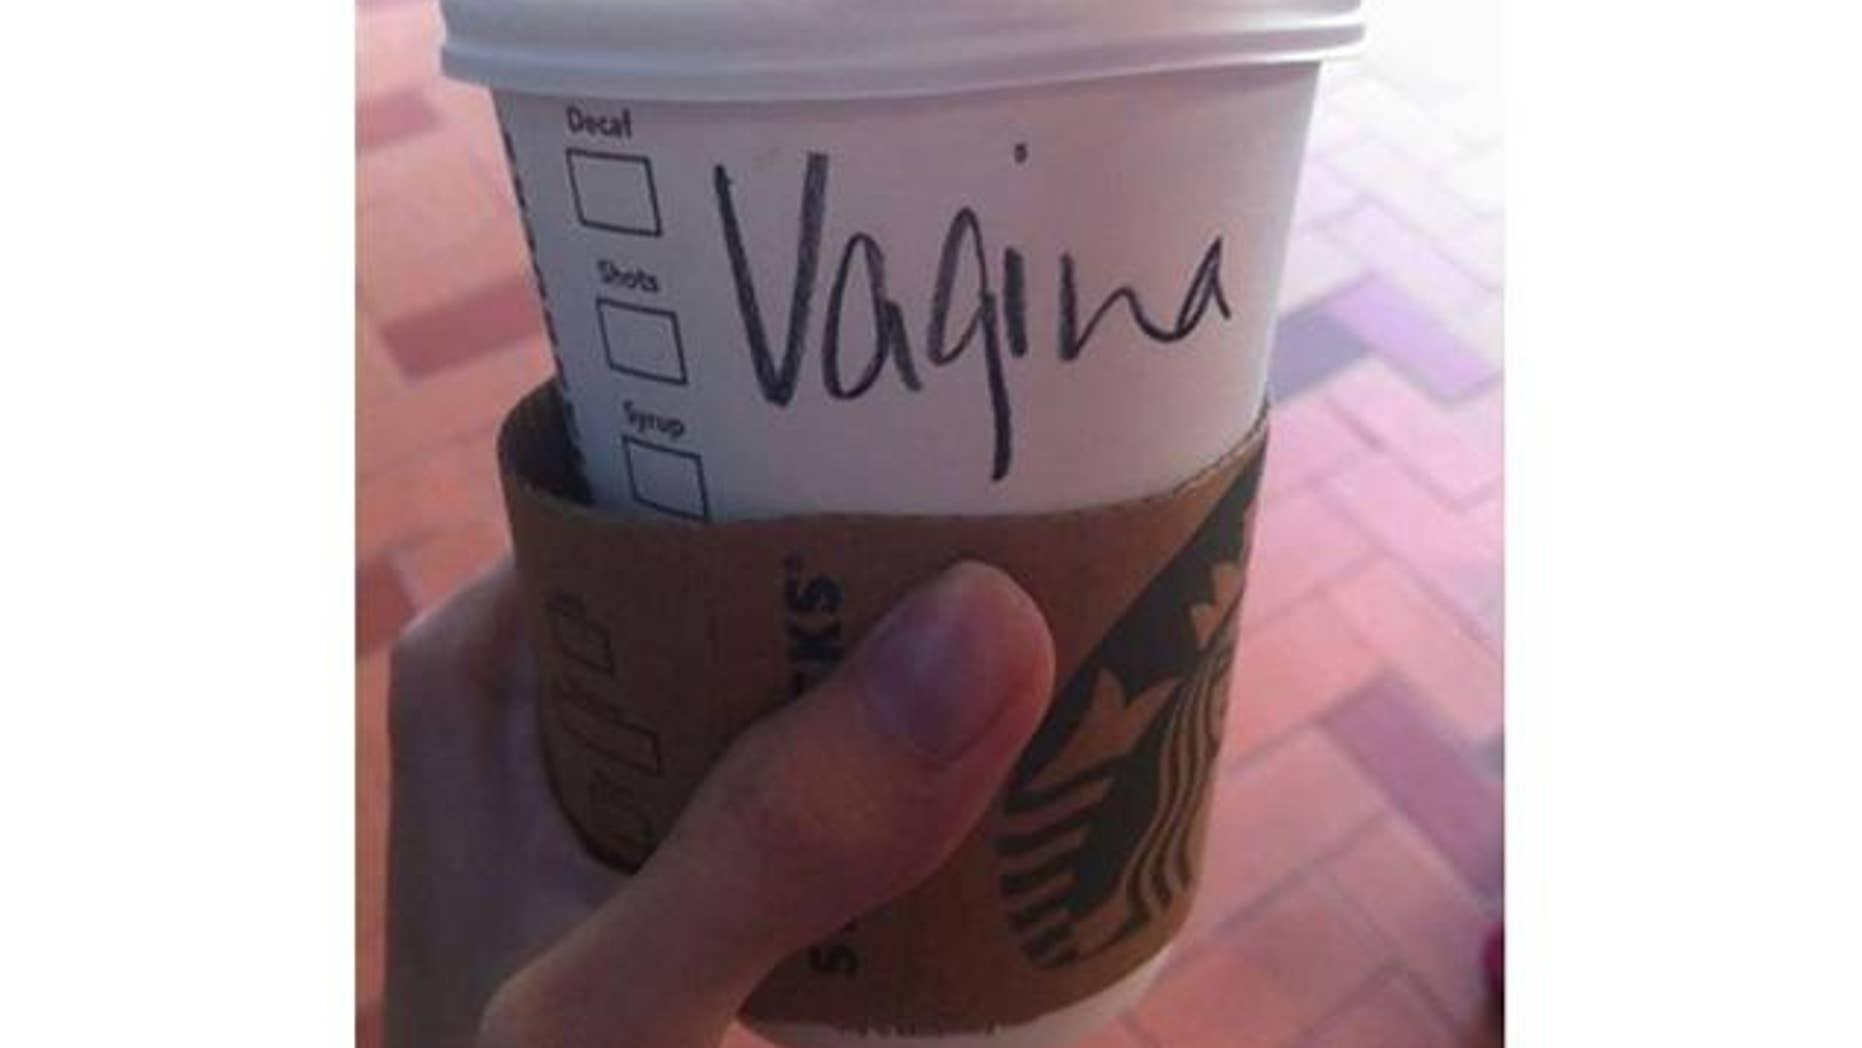 Virginia Goh's cup at a Hong Kong branch of Starbucks.